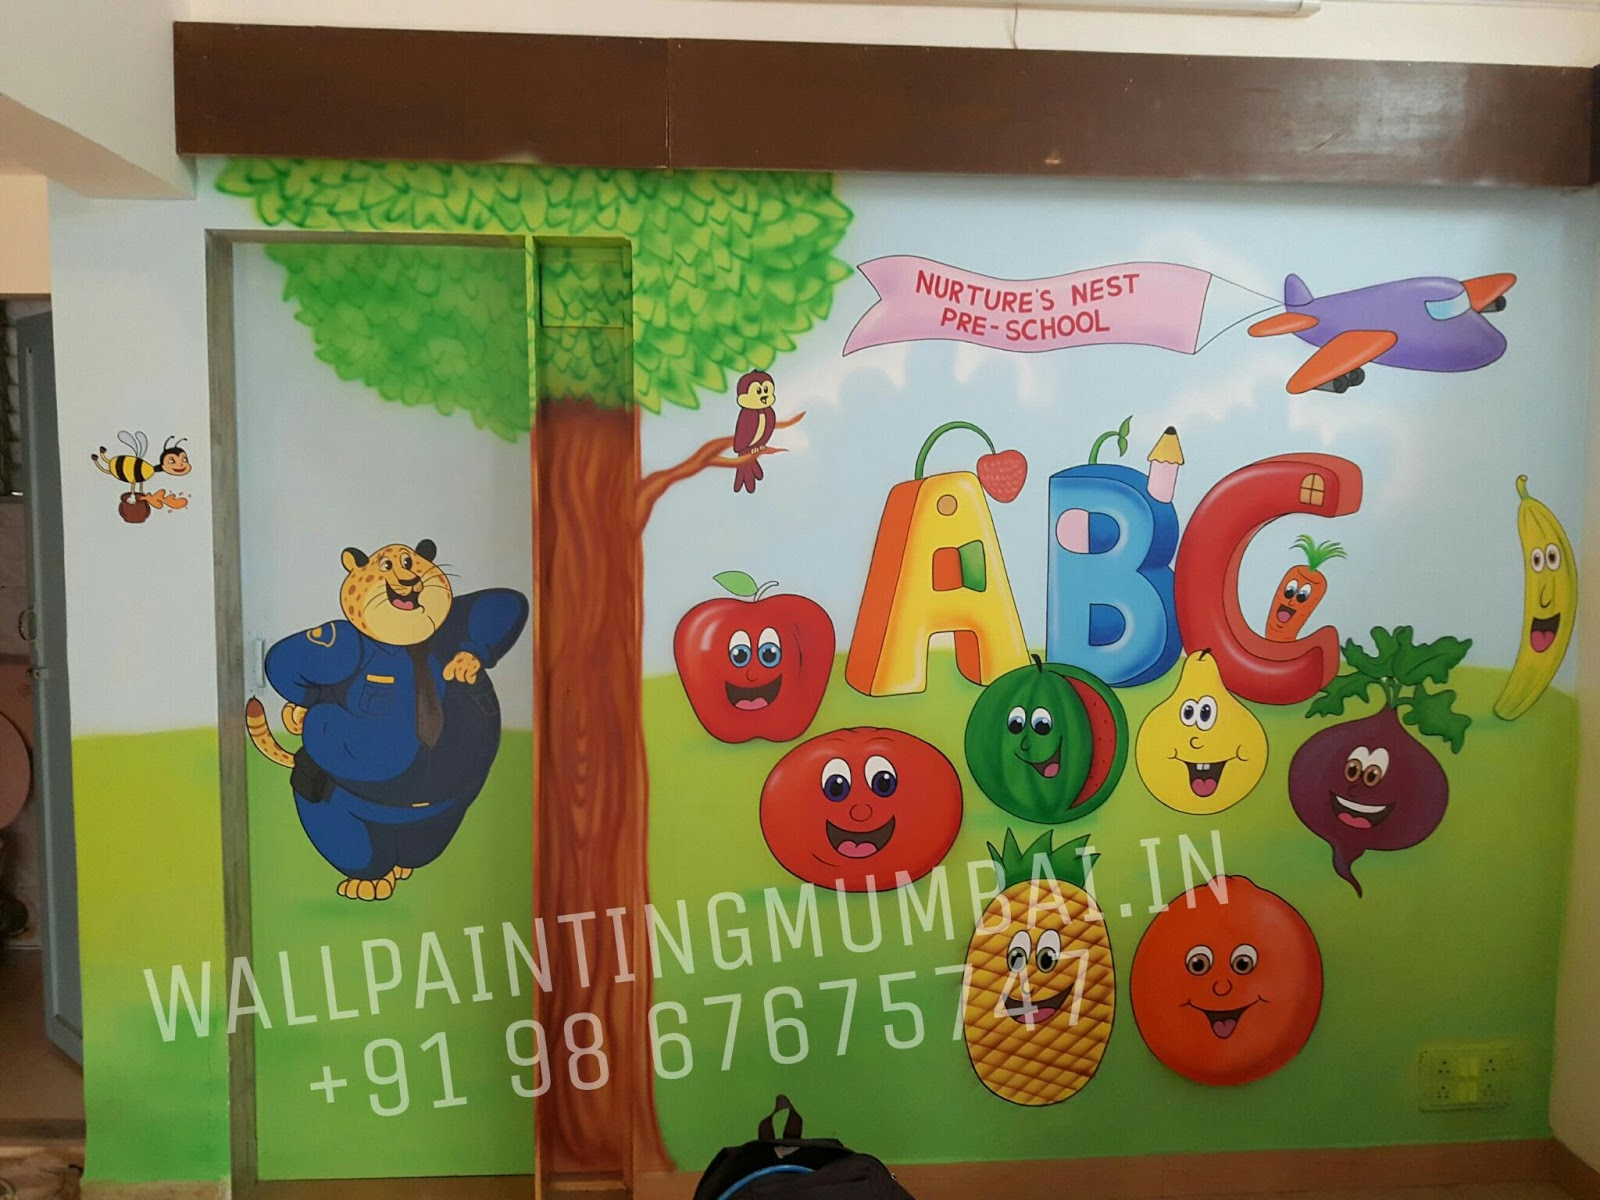 Family Tree Murals For Walls Kids Room Cartoon Painting Pre School Cartoon Wall